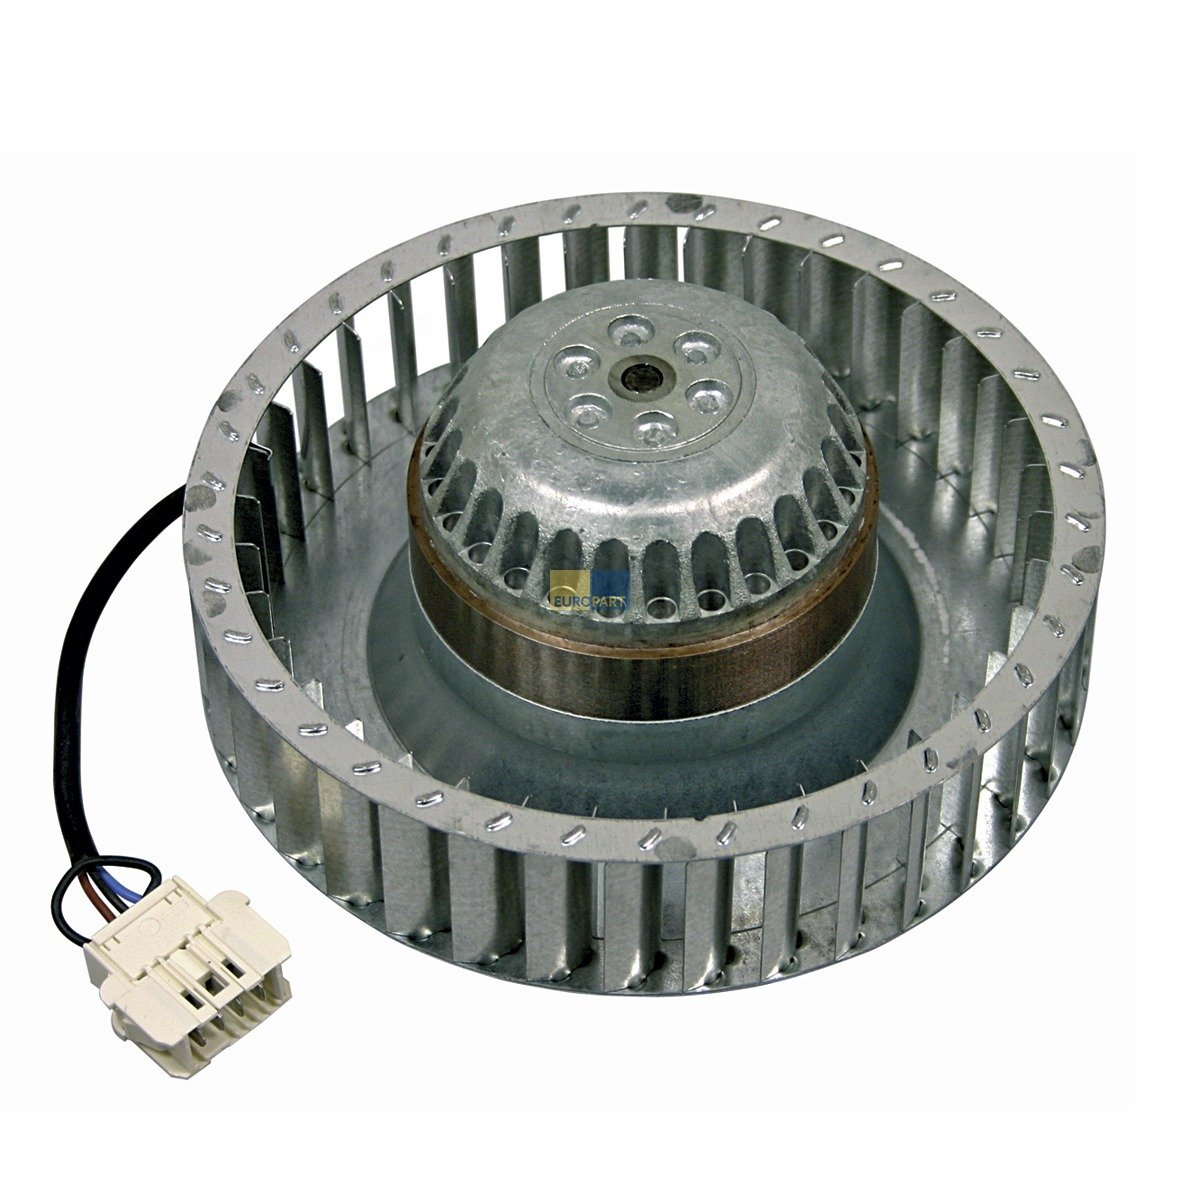 Lüftermotor 150W (OT) 112542200 AEG Elektrolux: Amazon.de: Elektro ...